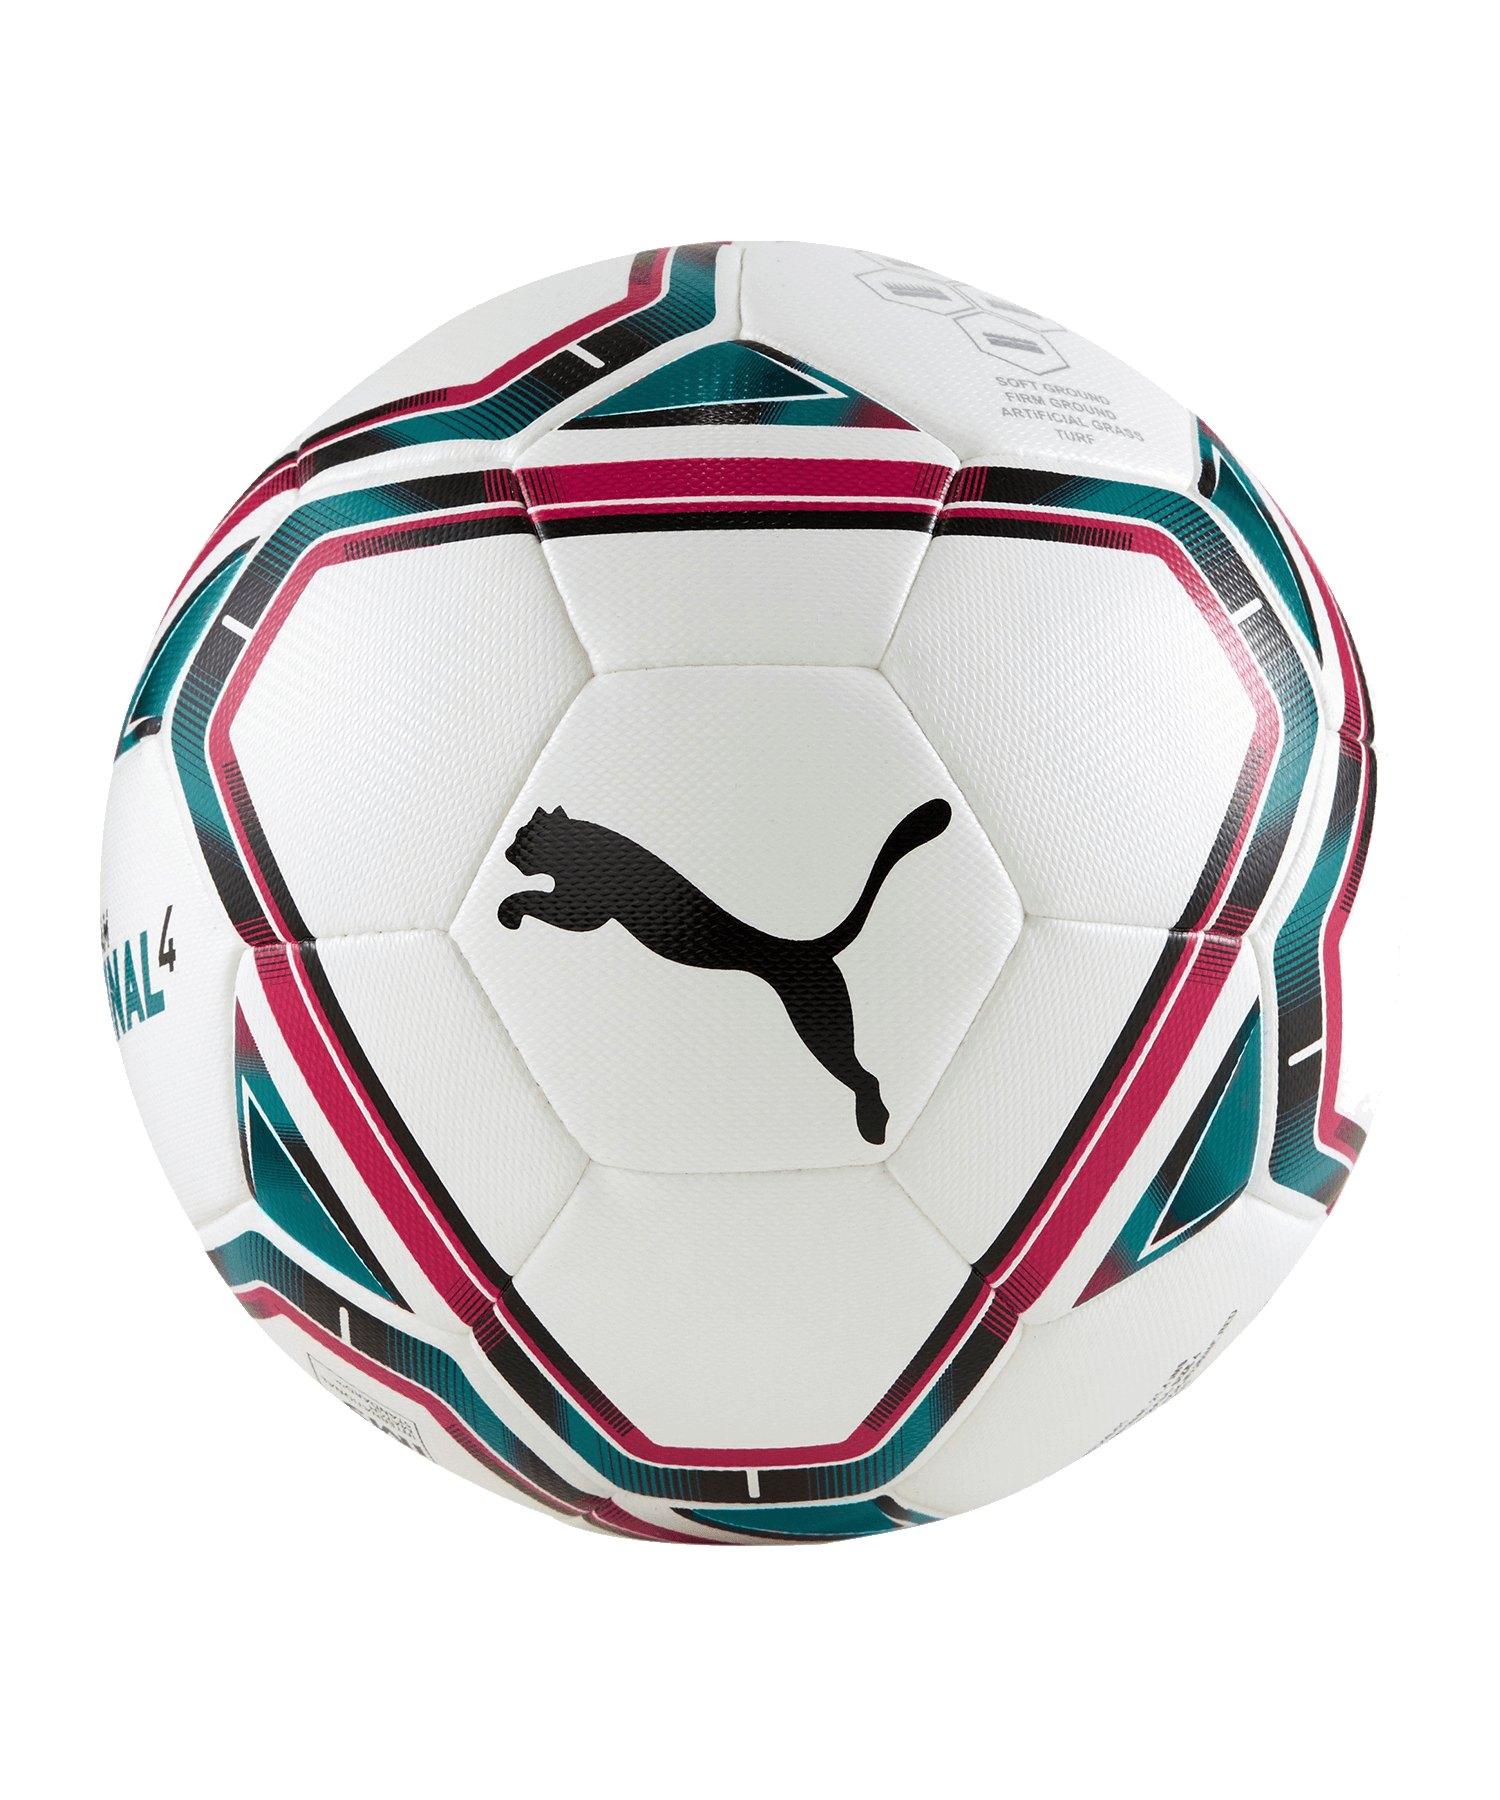 PUMA teamFINAL 21.4. IMS Hybrid Ball Gr. 4 F01 - weiss